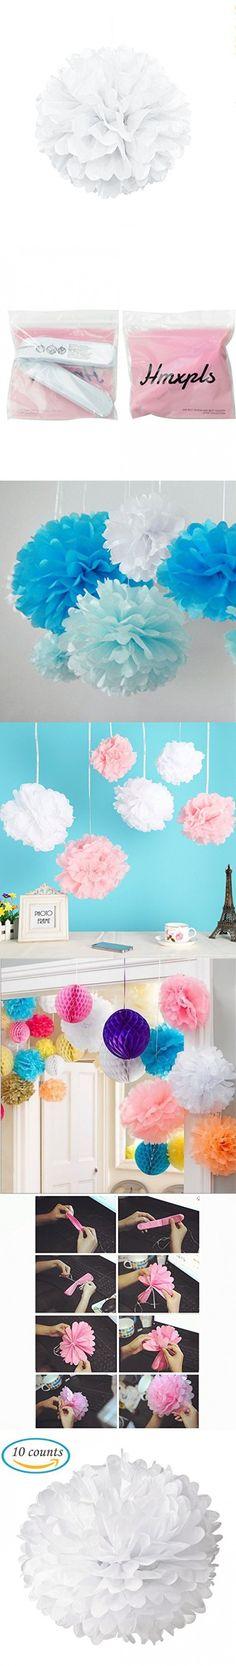 Hmxpls 10pcs Tissue Paper Pom-poms Flower Ball Wedding Party Outdoor Decoration (White)